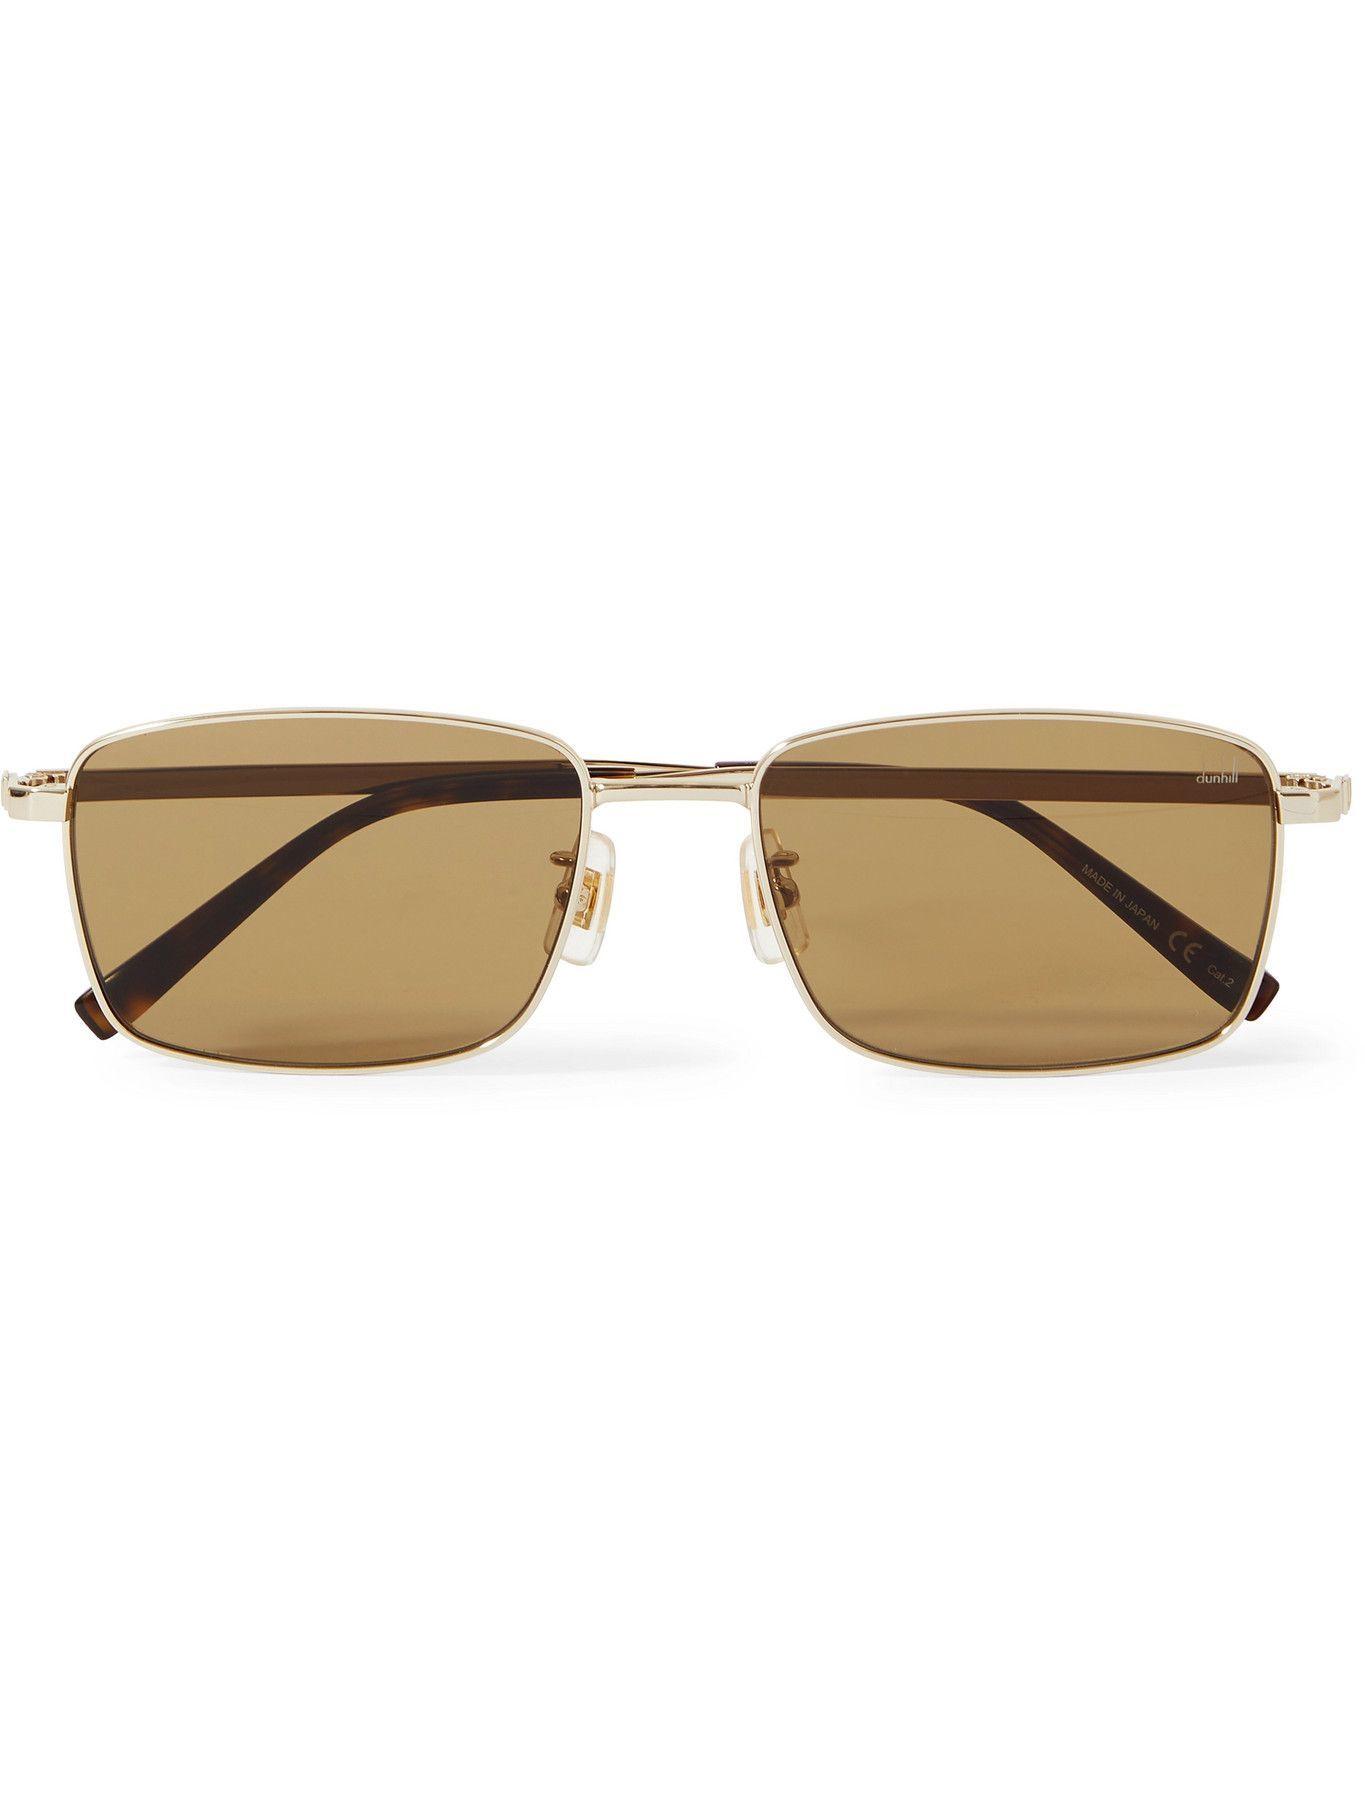 DUNHILL - Square-Frame Gold-Tone Sunglasses